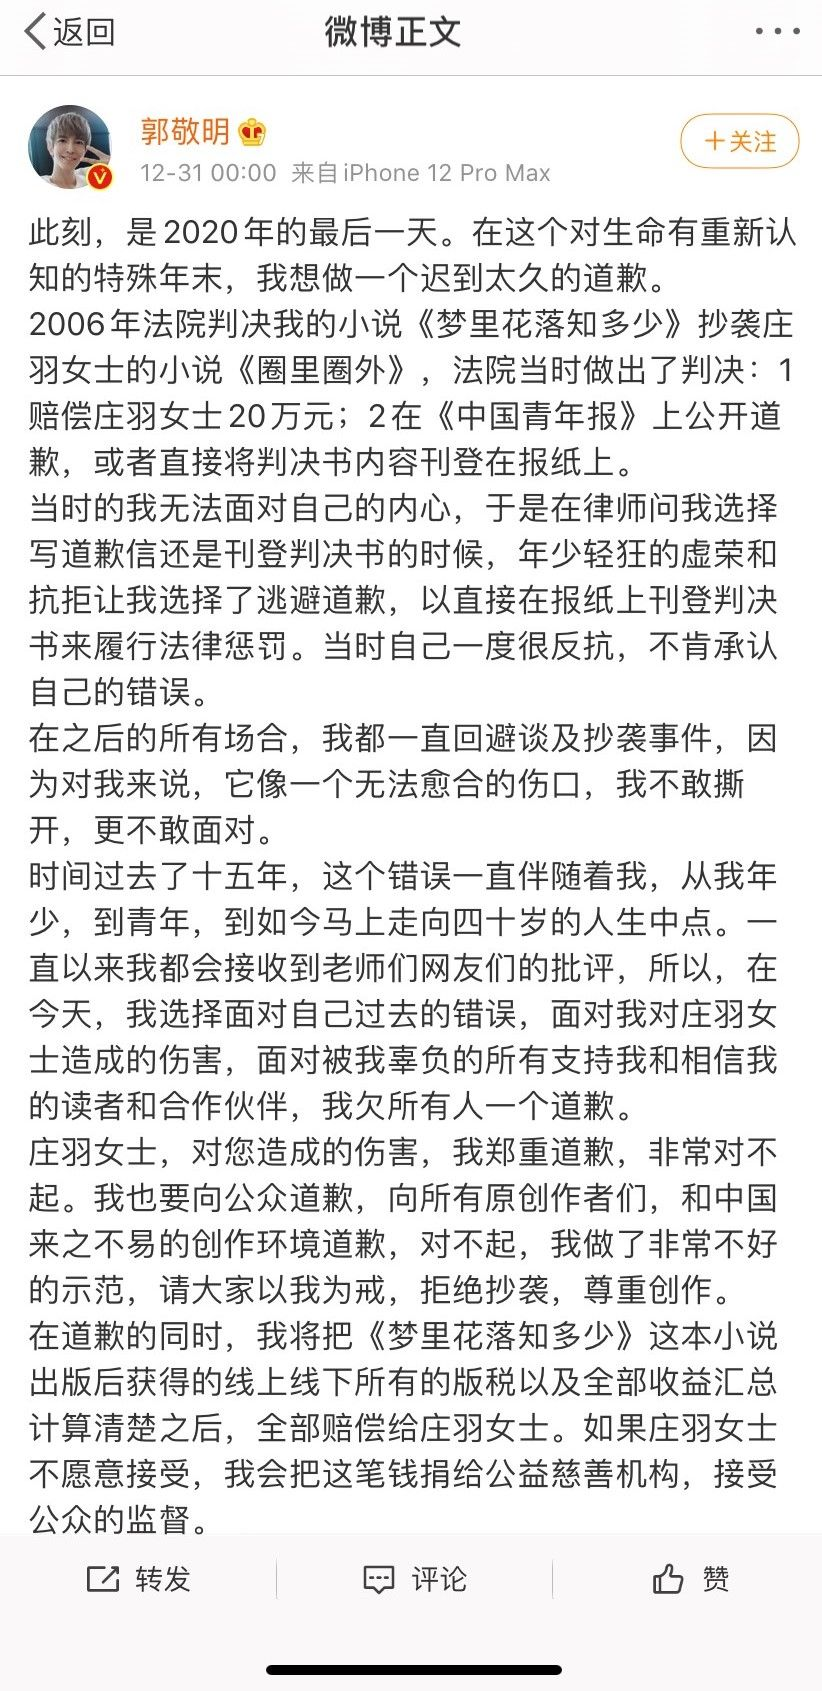 usdt无需实名买卖(caibao.it):为什么有些人过良久才会致歉? 第2张